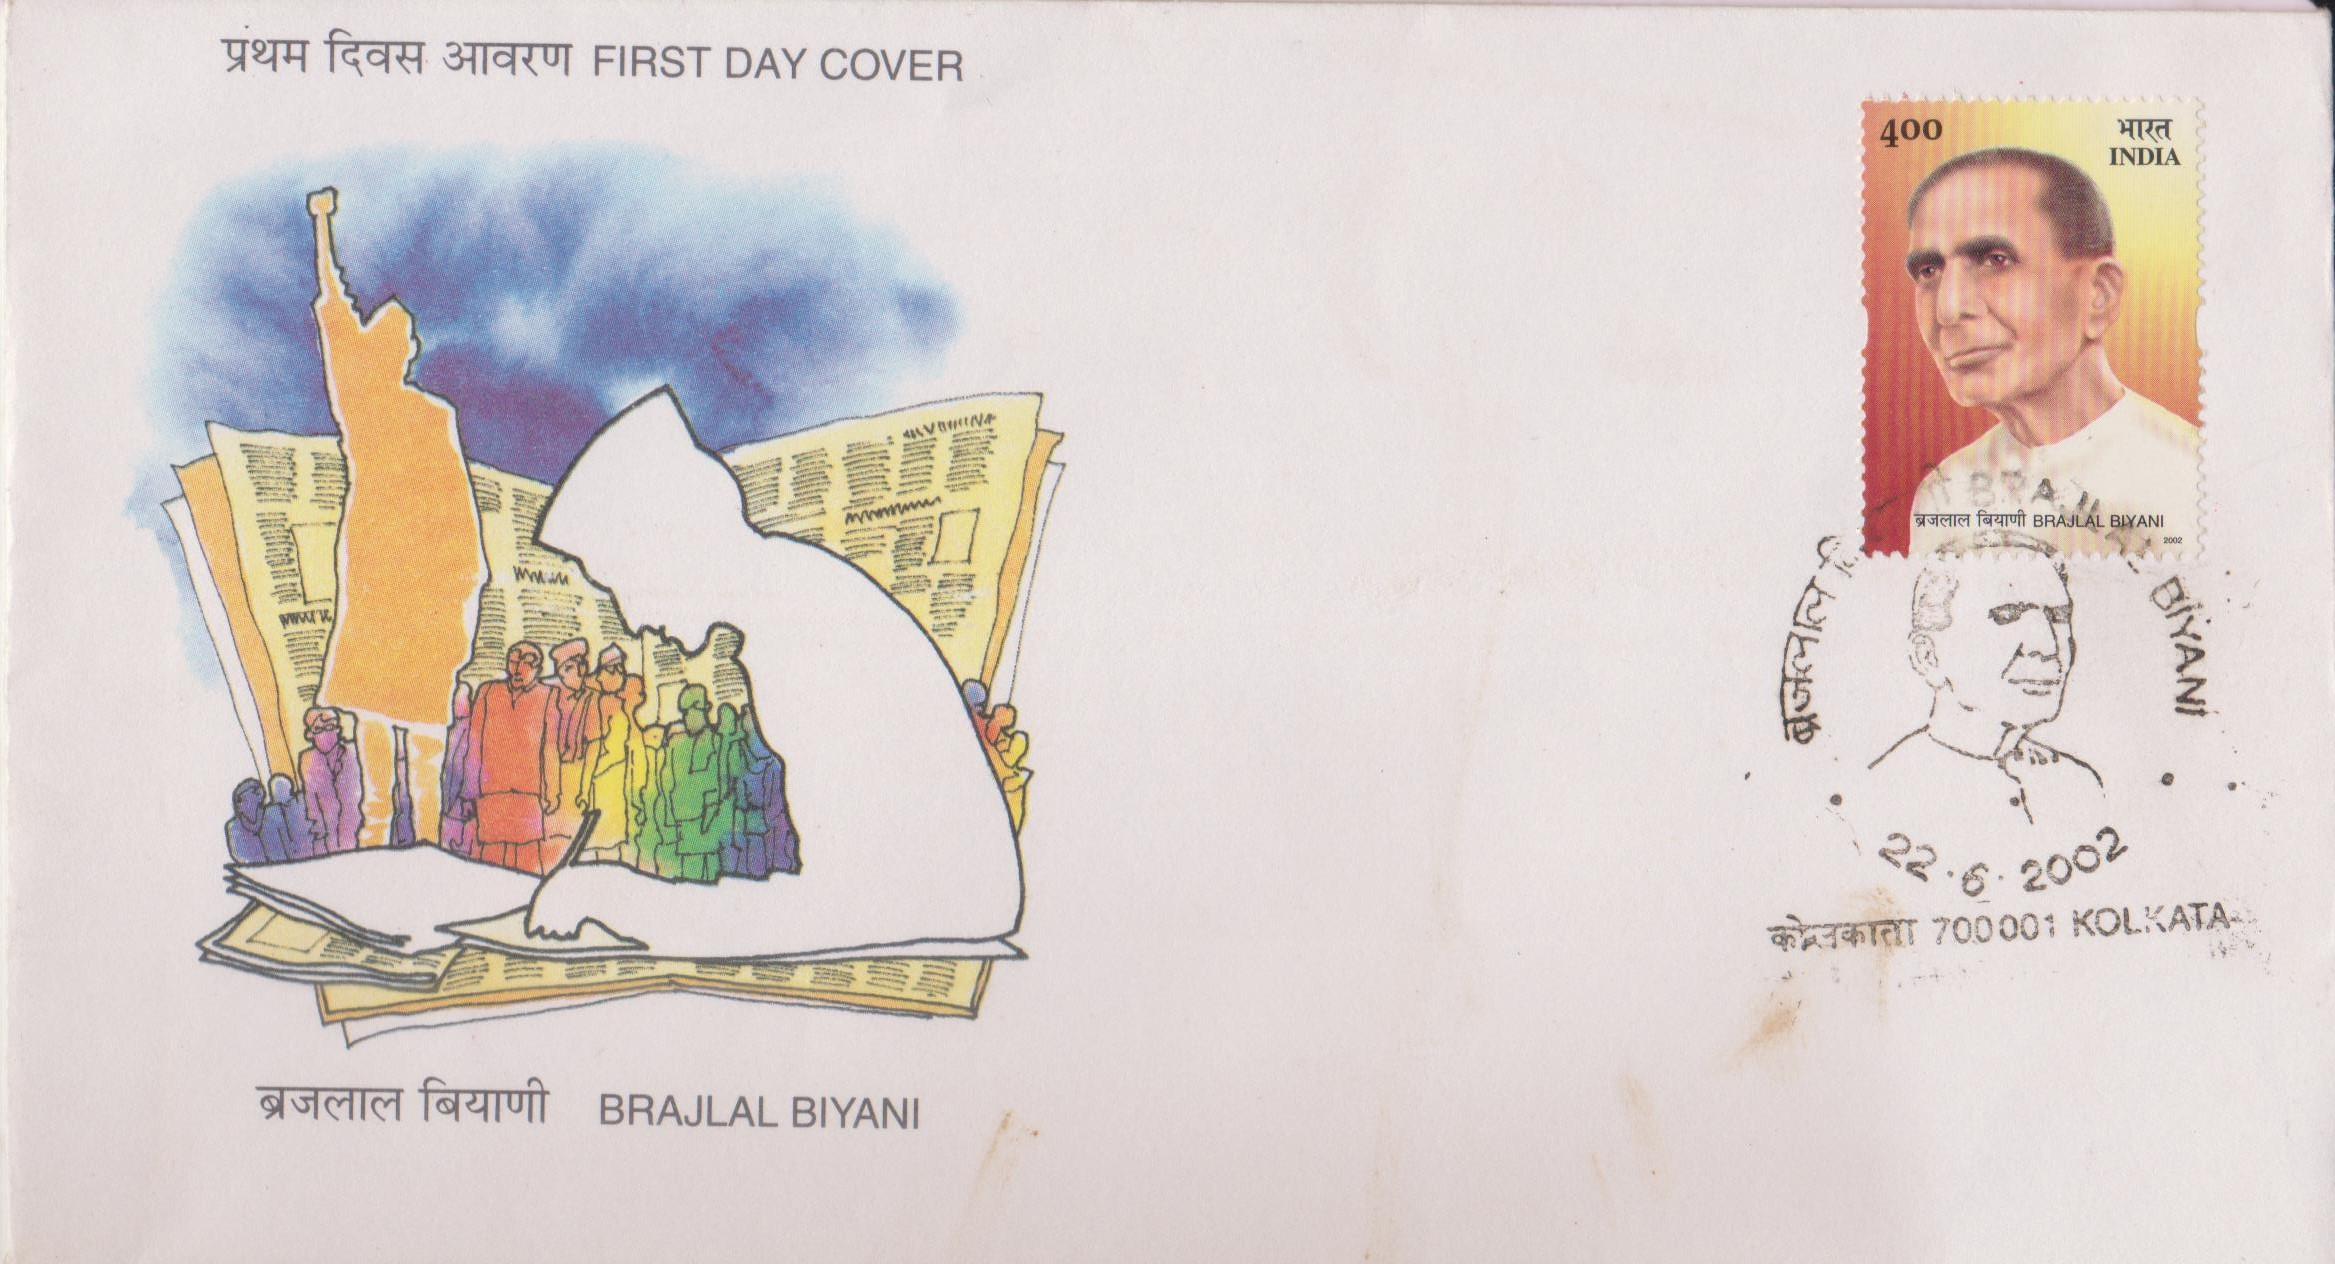 Dahihanda Salt Satyagraha, Jungle Satyagraha & Struggle against Nizam